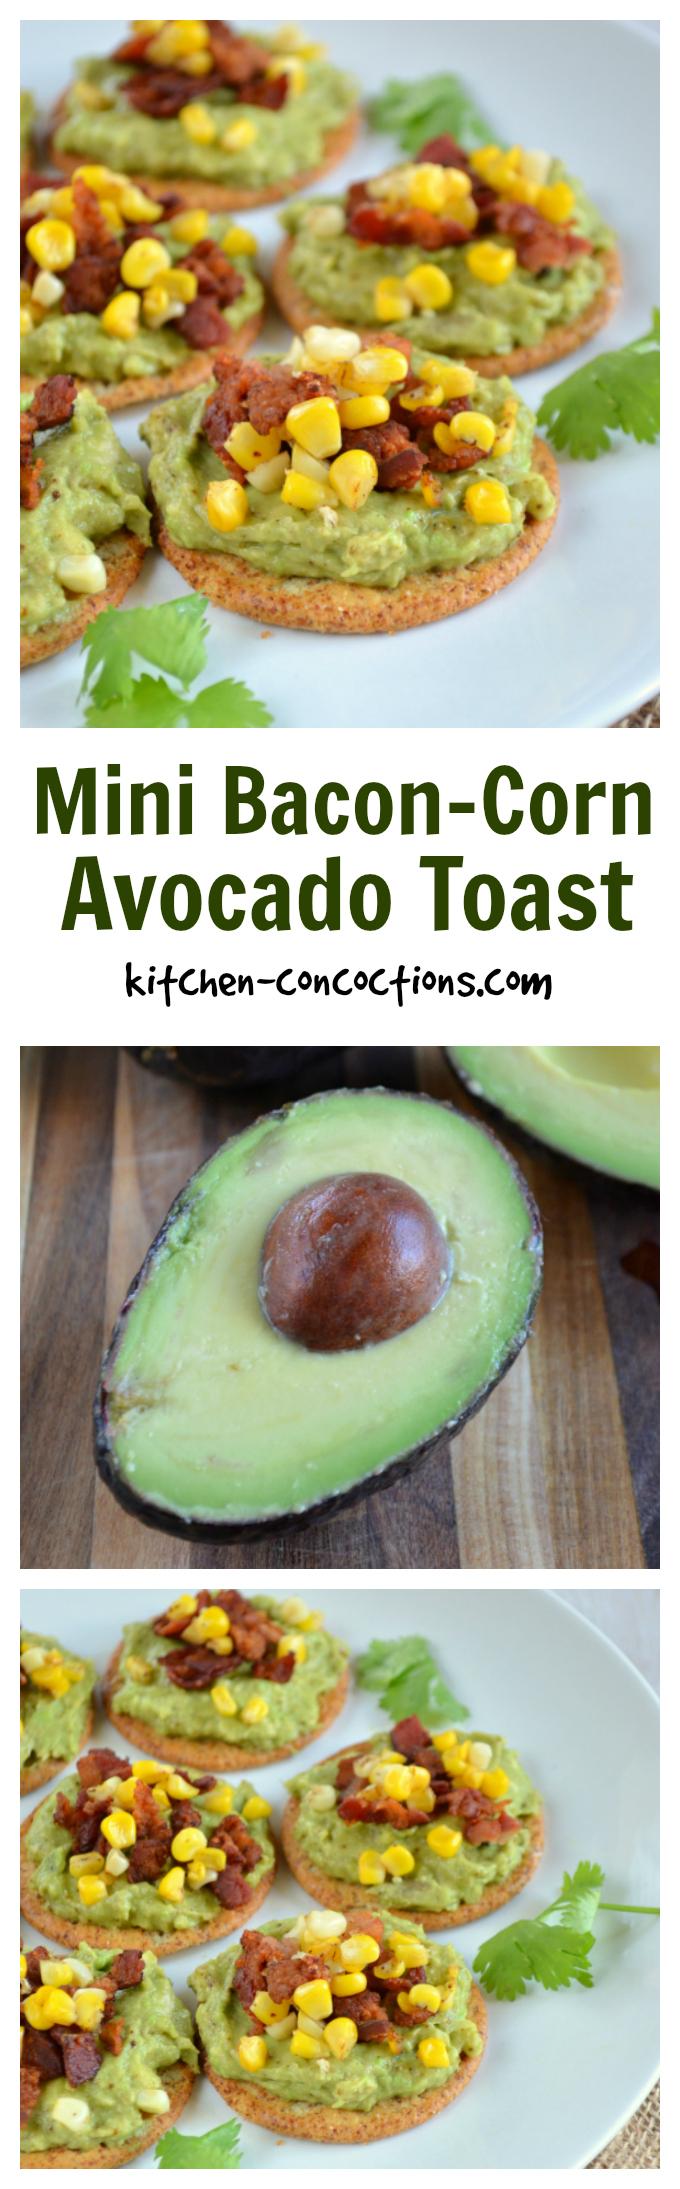 Bacon-Corn Avocado Toast